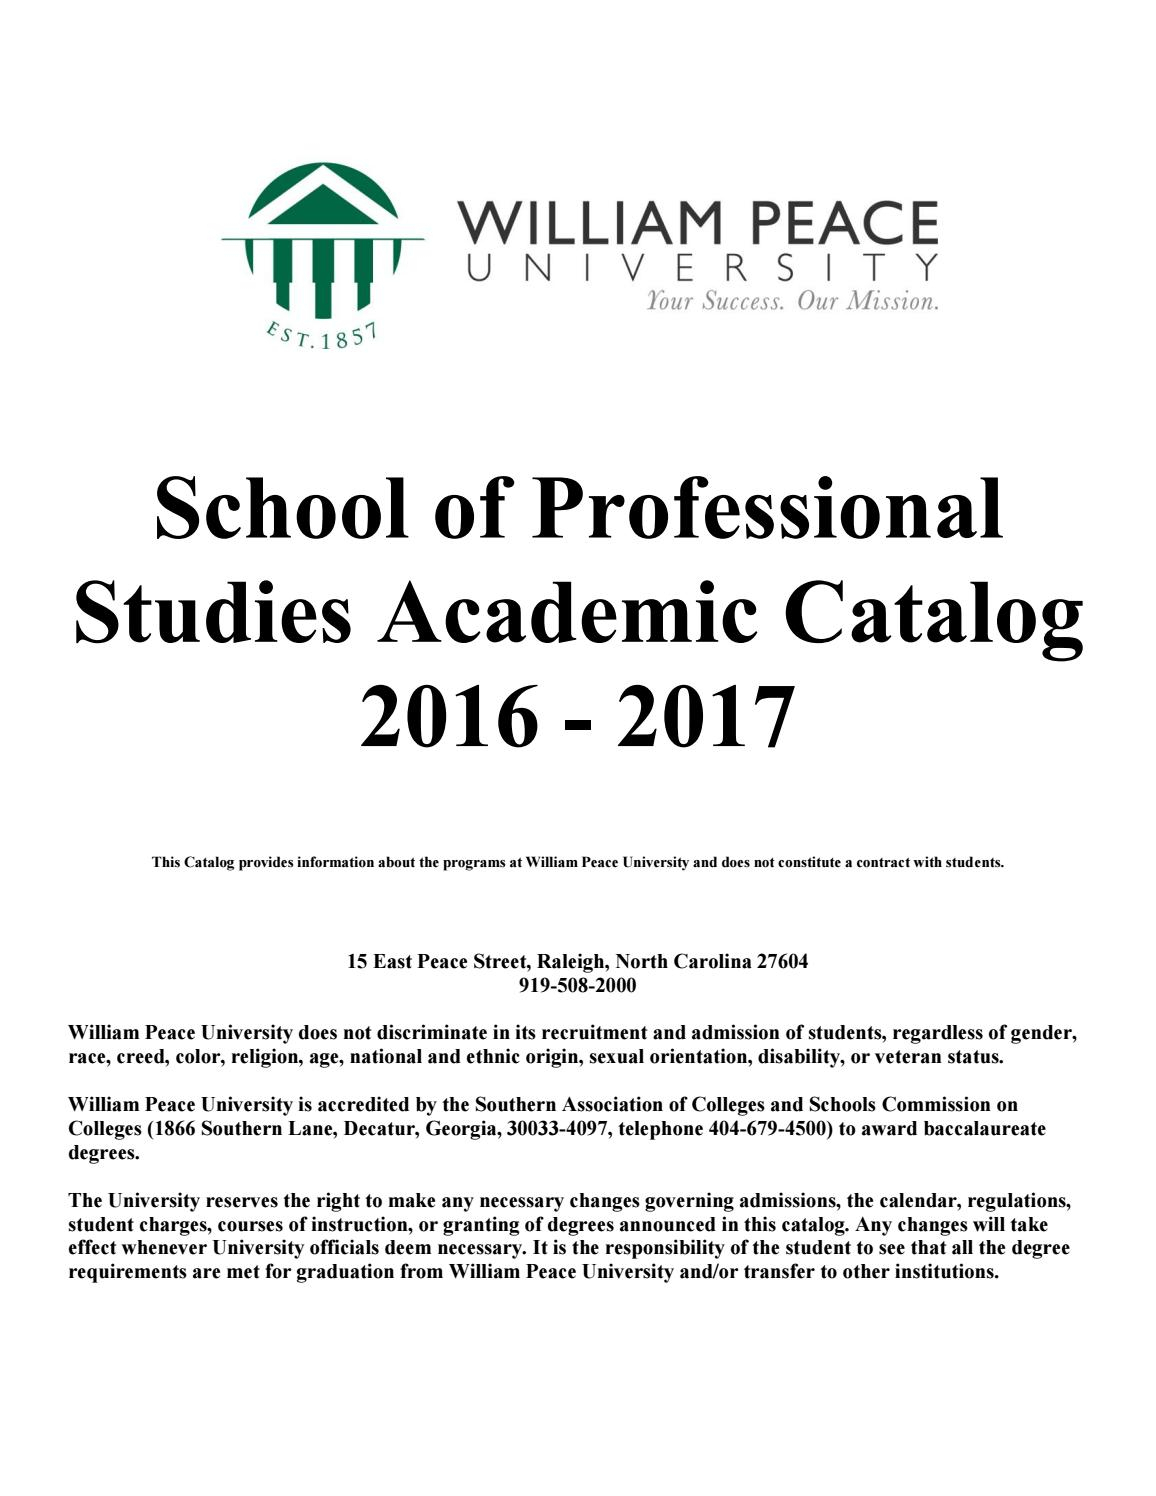 Sps Academic Catalog William Peace University